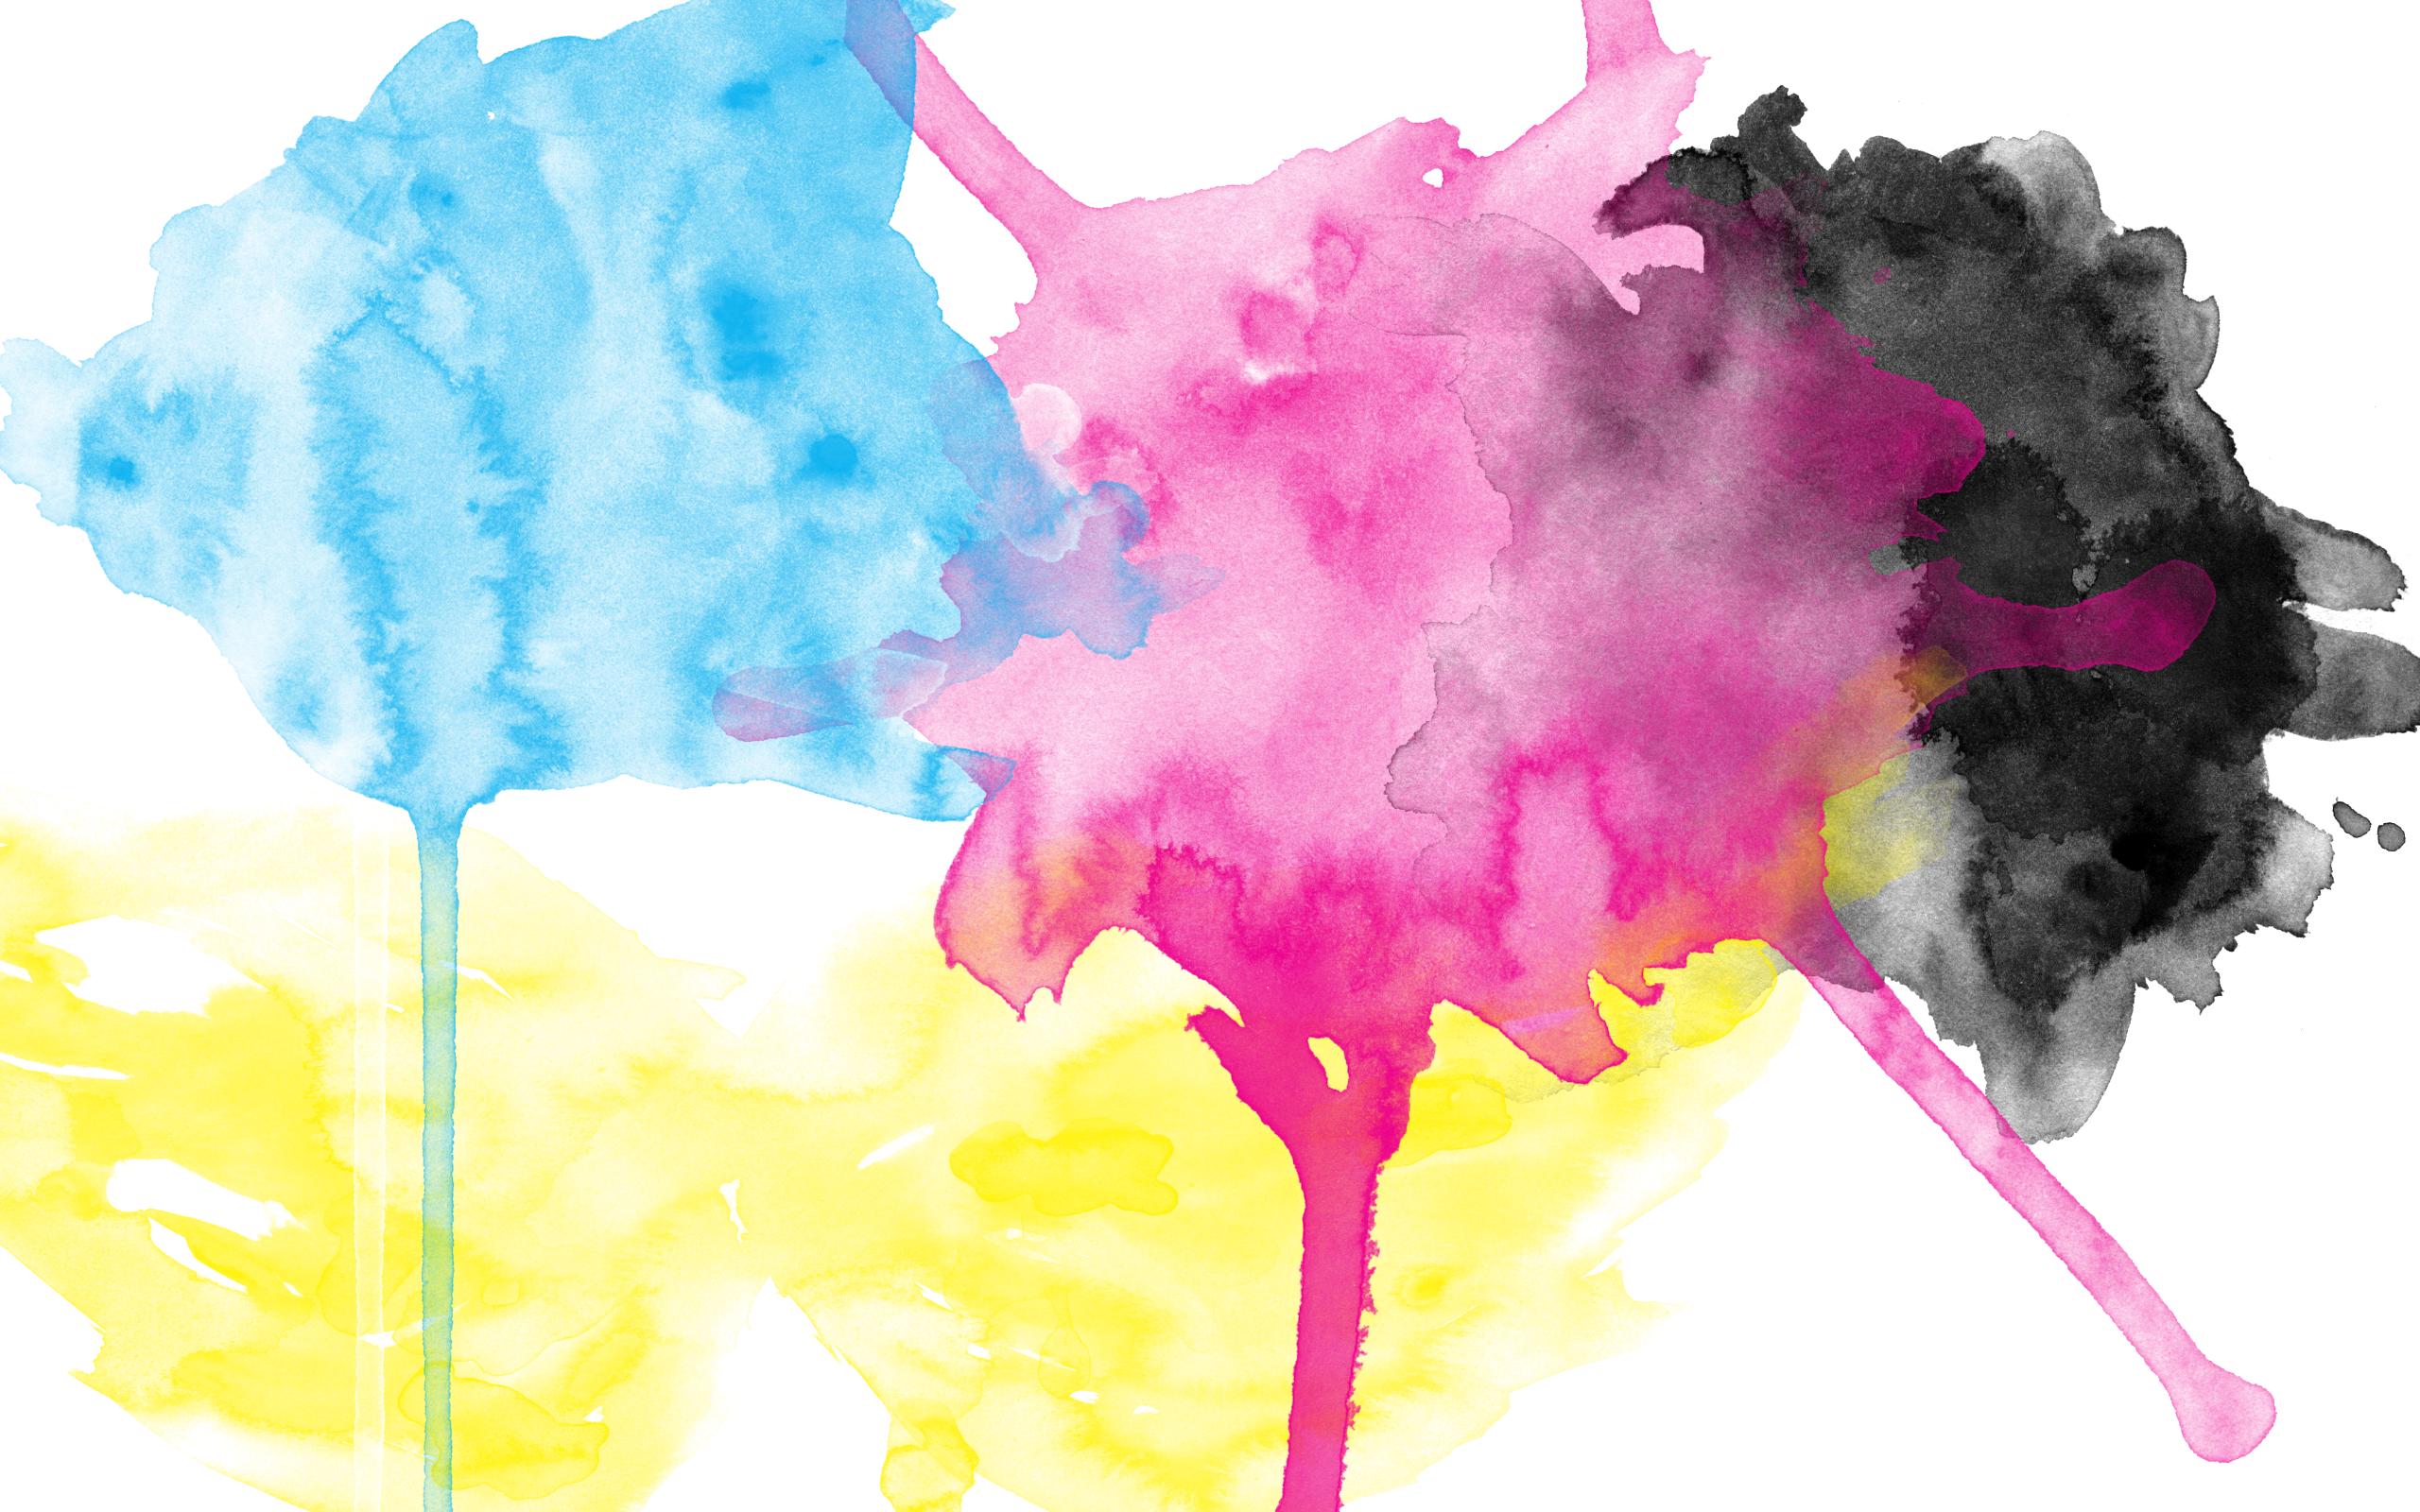 Abstract Water Painting Colors Samsung Galaxy S5 Hd: Watercolour Wallpaper